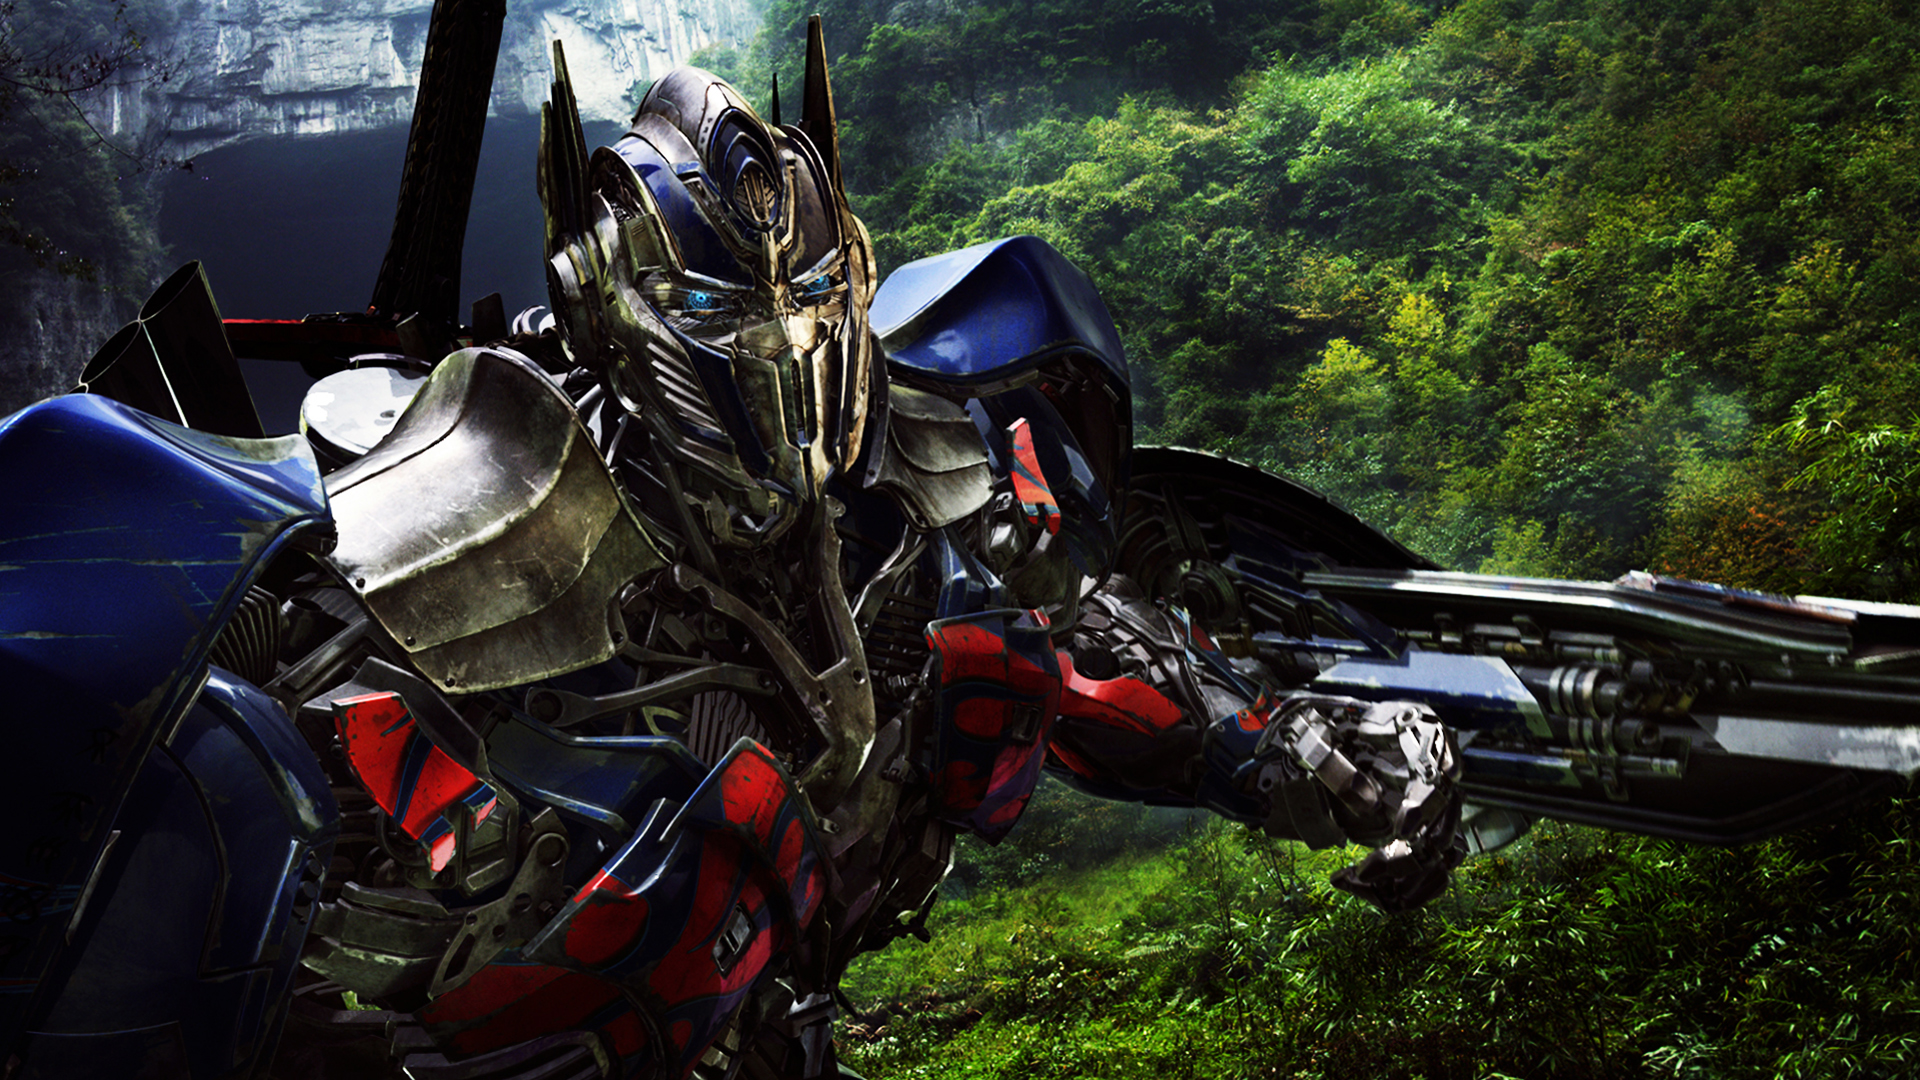 optimus prime transformers age of extinction 4 2014 1920x1080